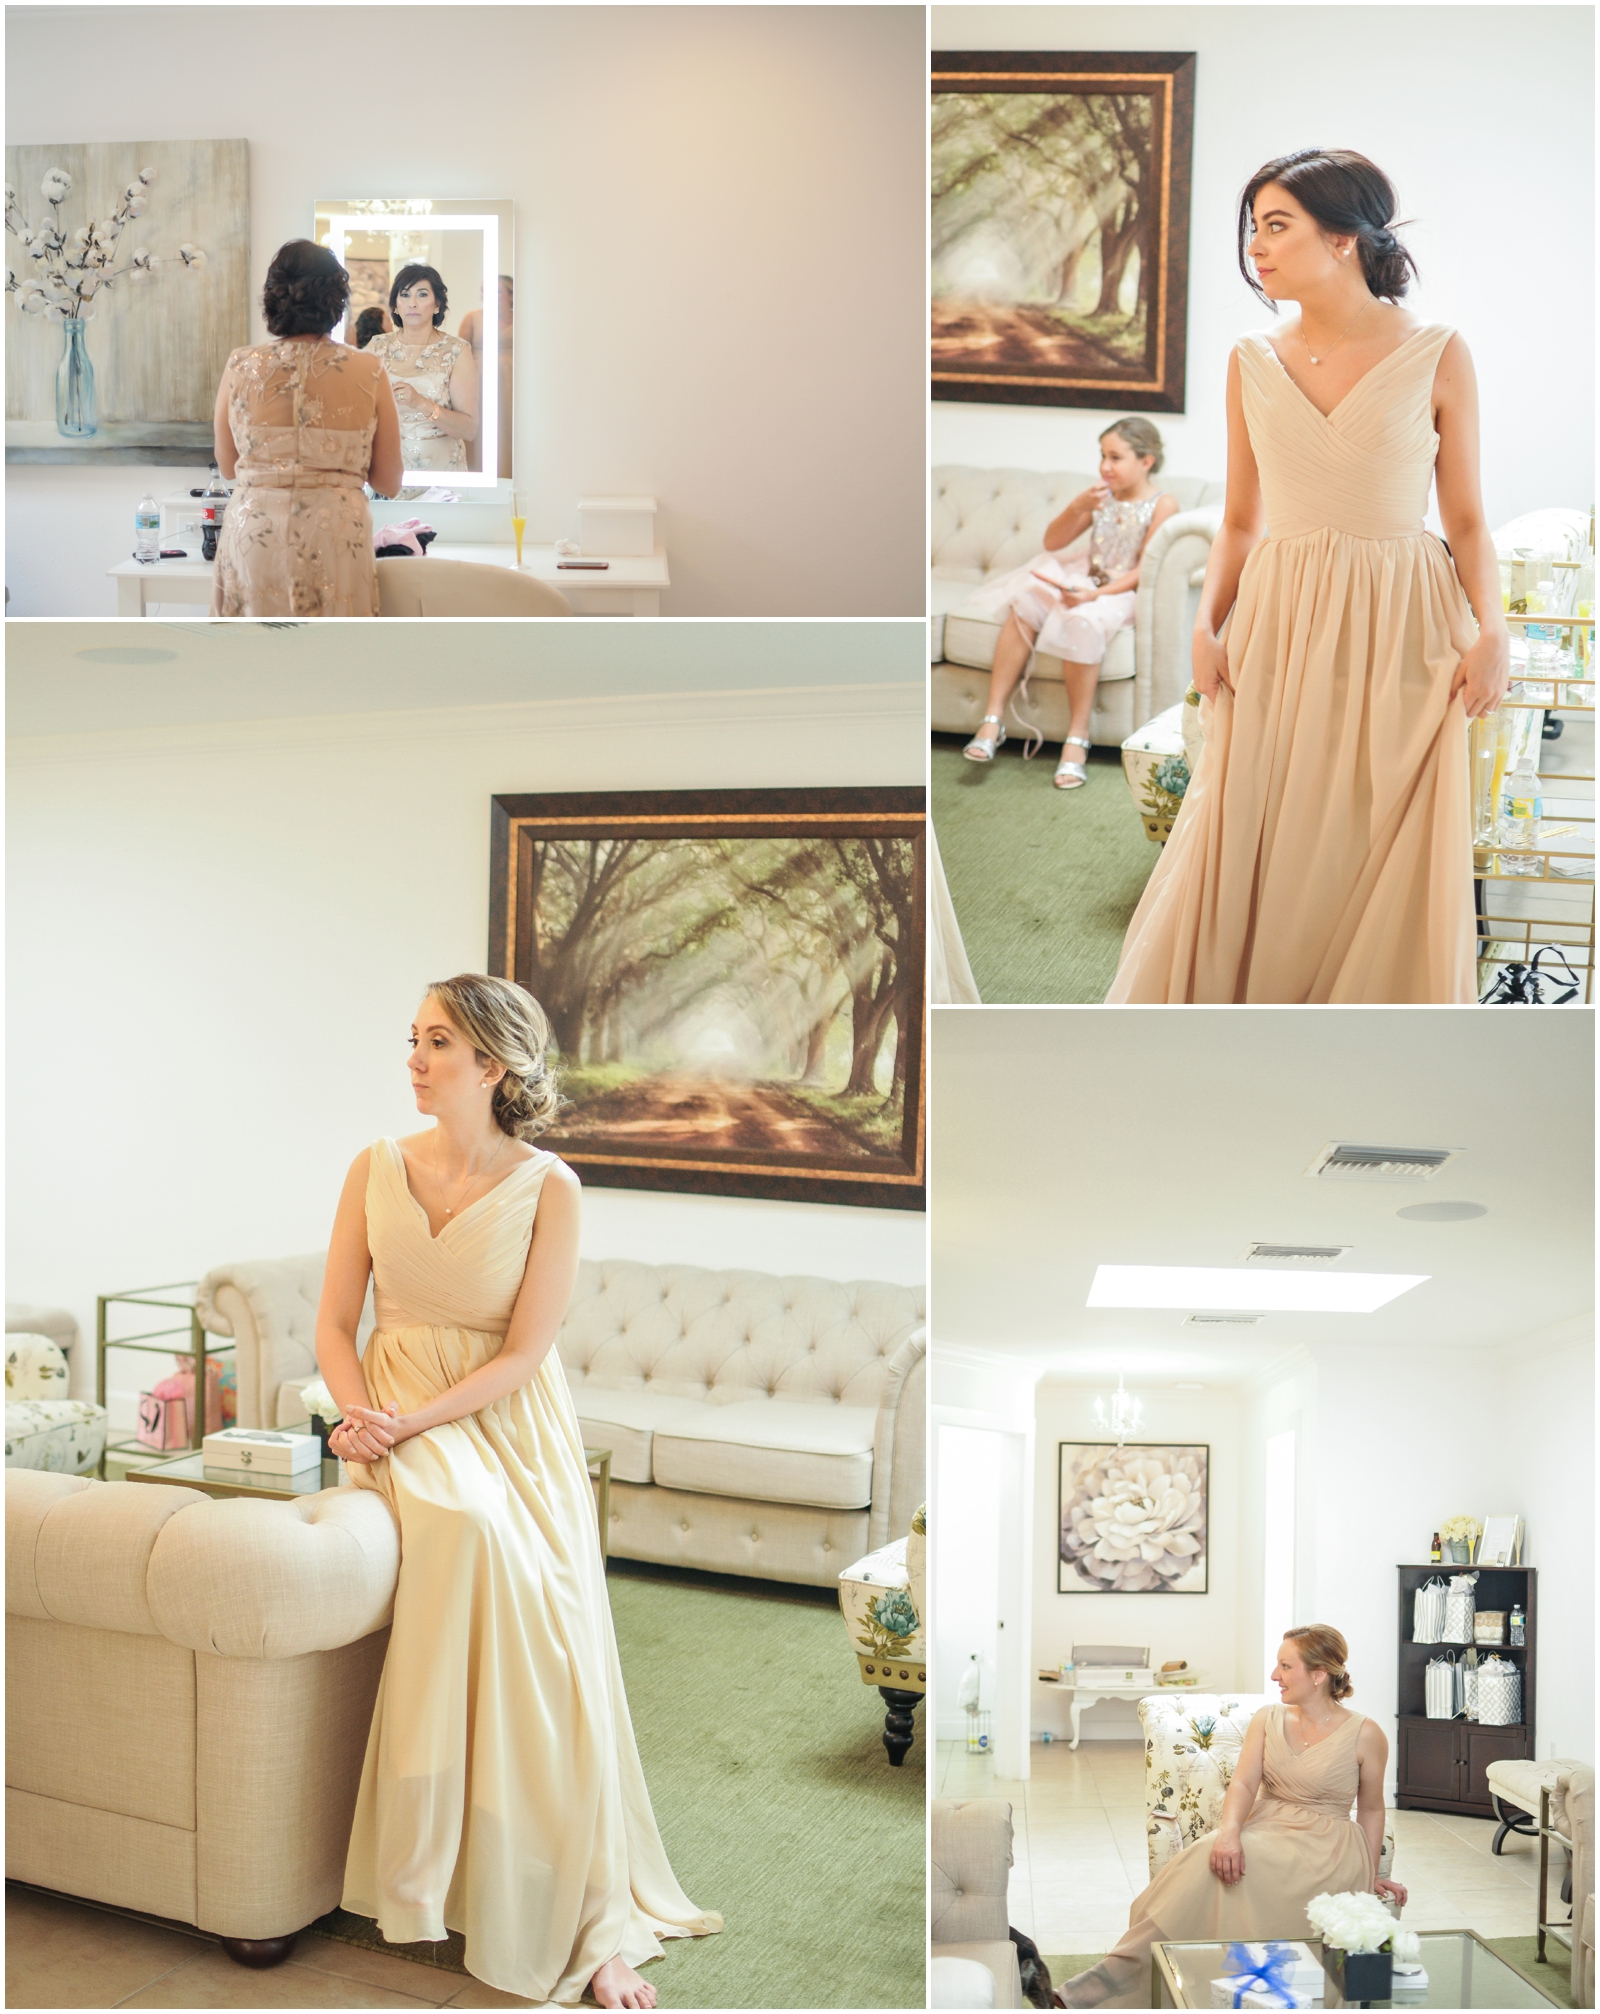 Rustic-Elegant-Wedding-Venue-in-Tampa-Stonebridge-Events_0416.jpg